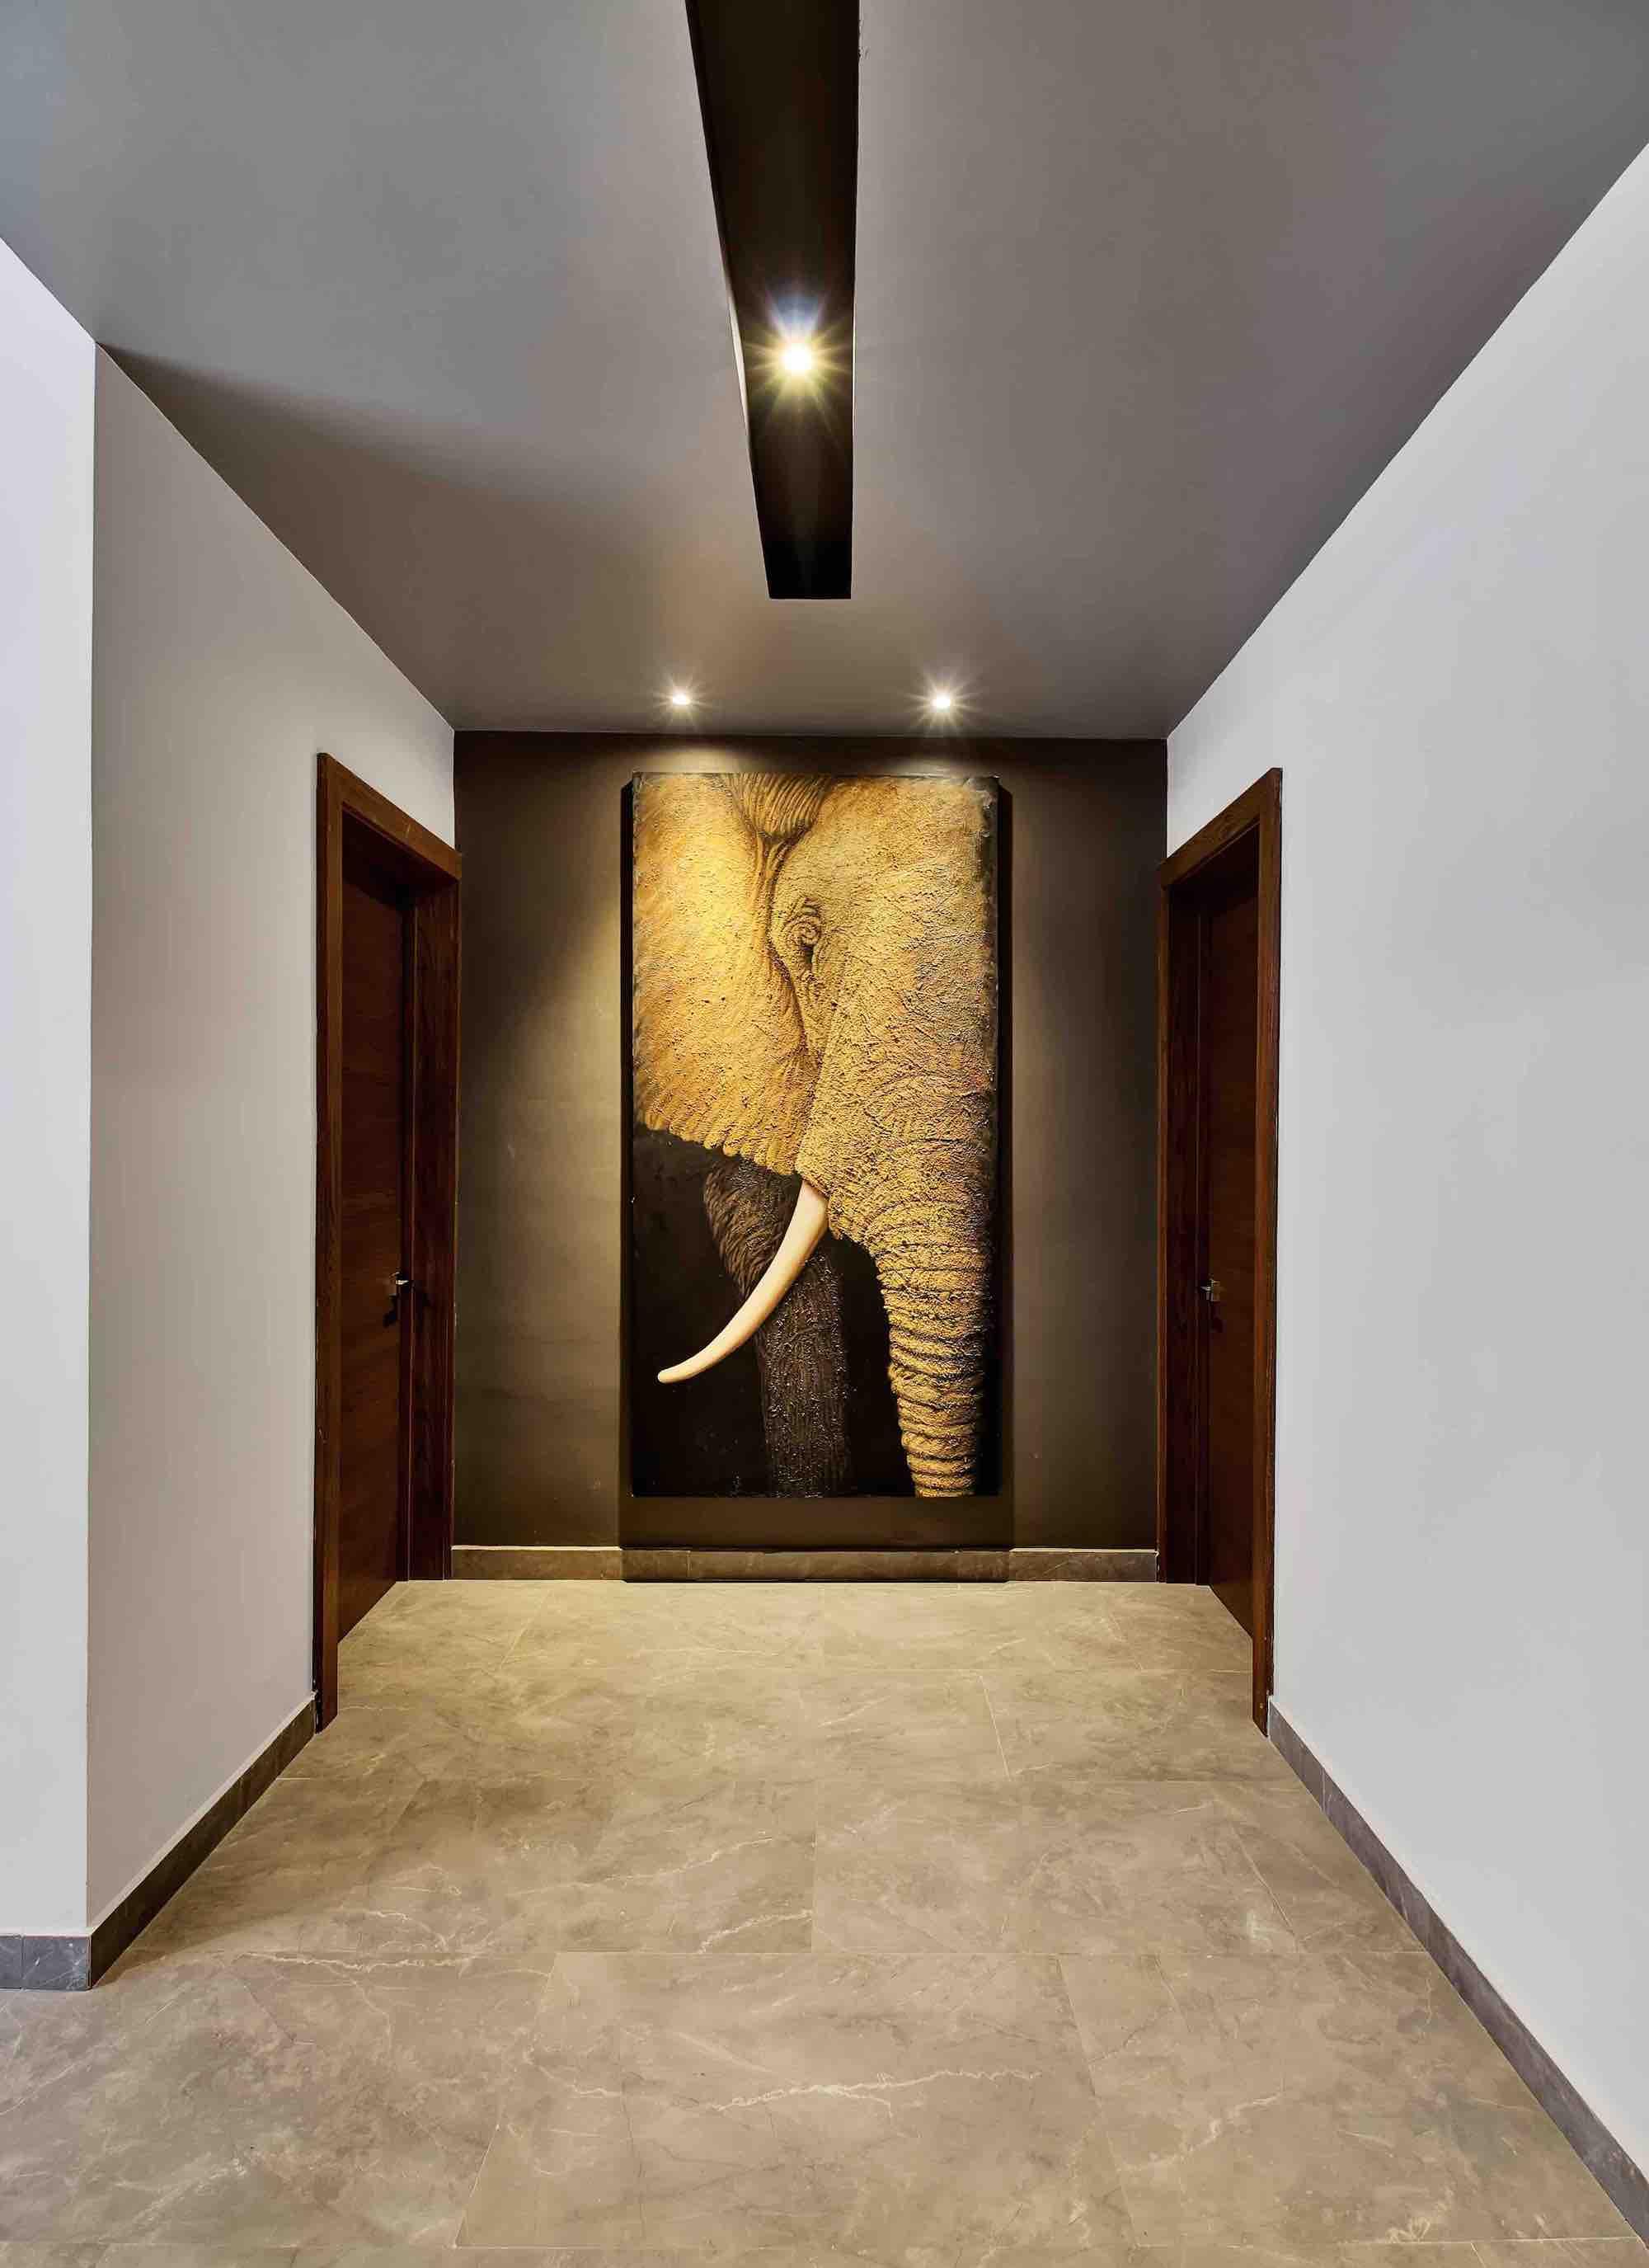 GR_House_Gallardo_arquitectura_amazingarchitecture_mexico_018.jpg